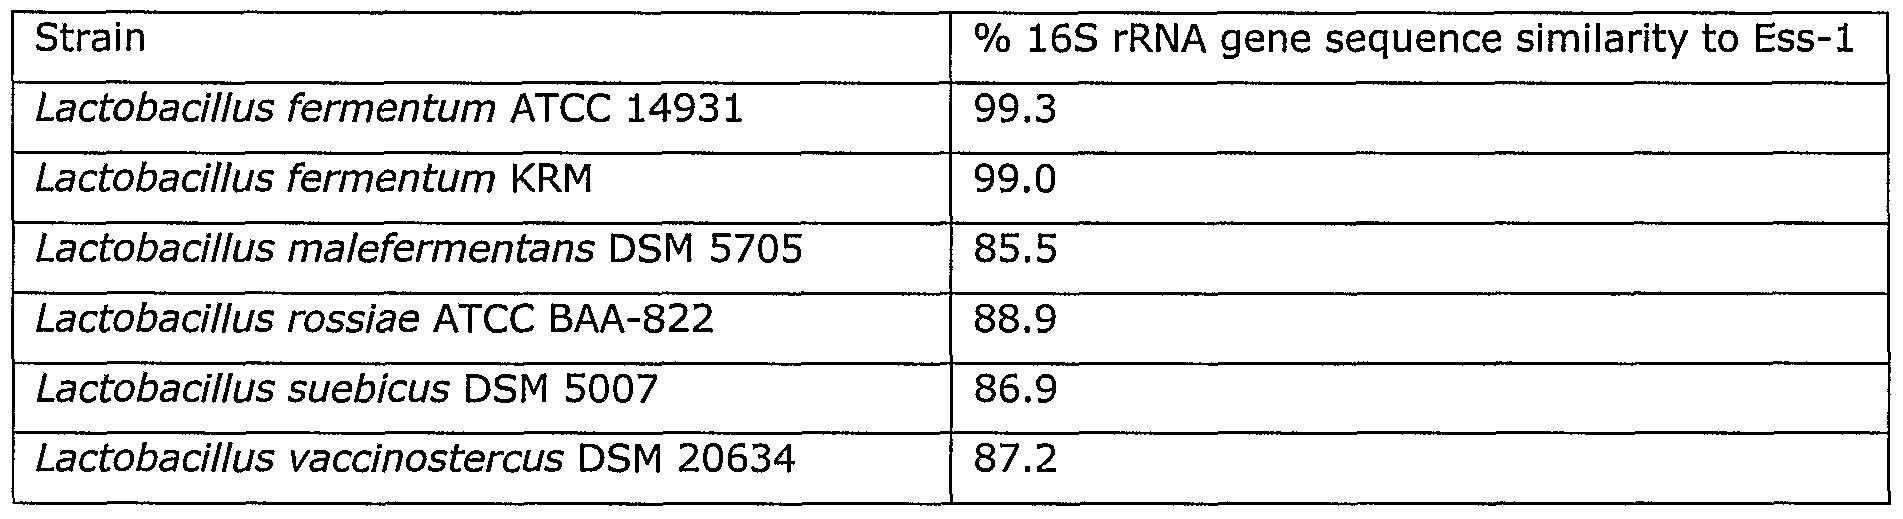 WO2008060198A1 - Lactobacillus fermentum ess-1, dsm17851 and its use